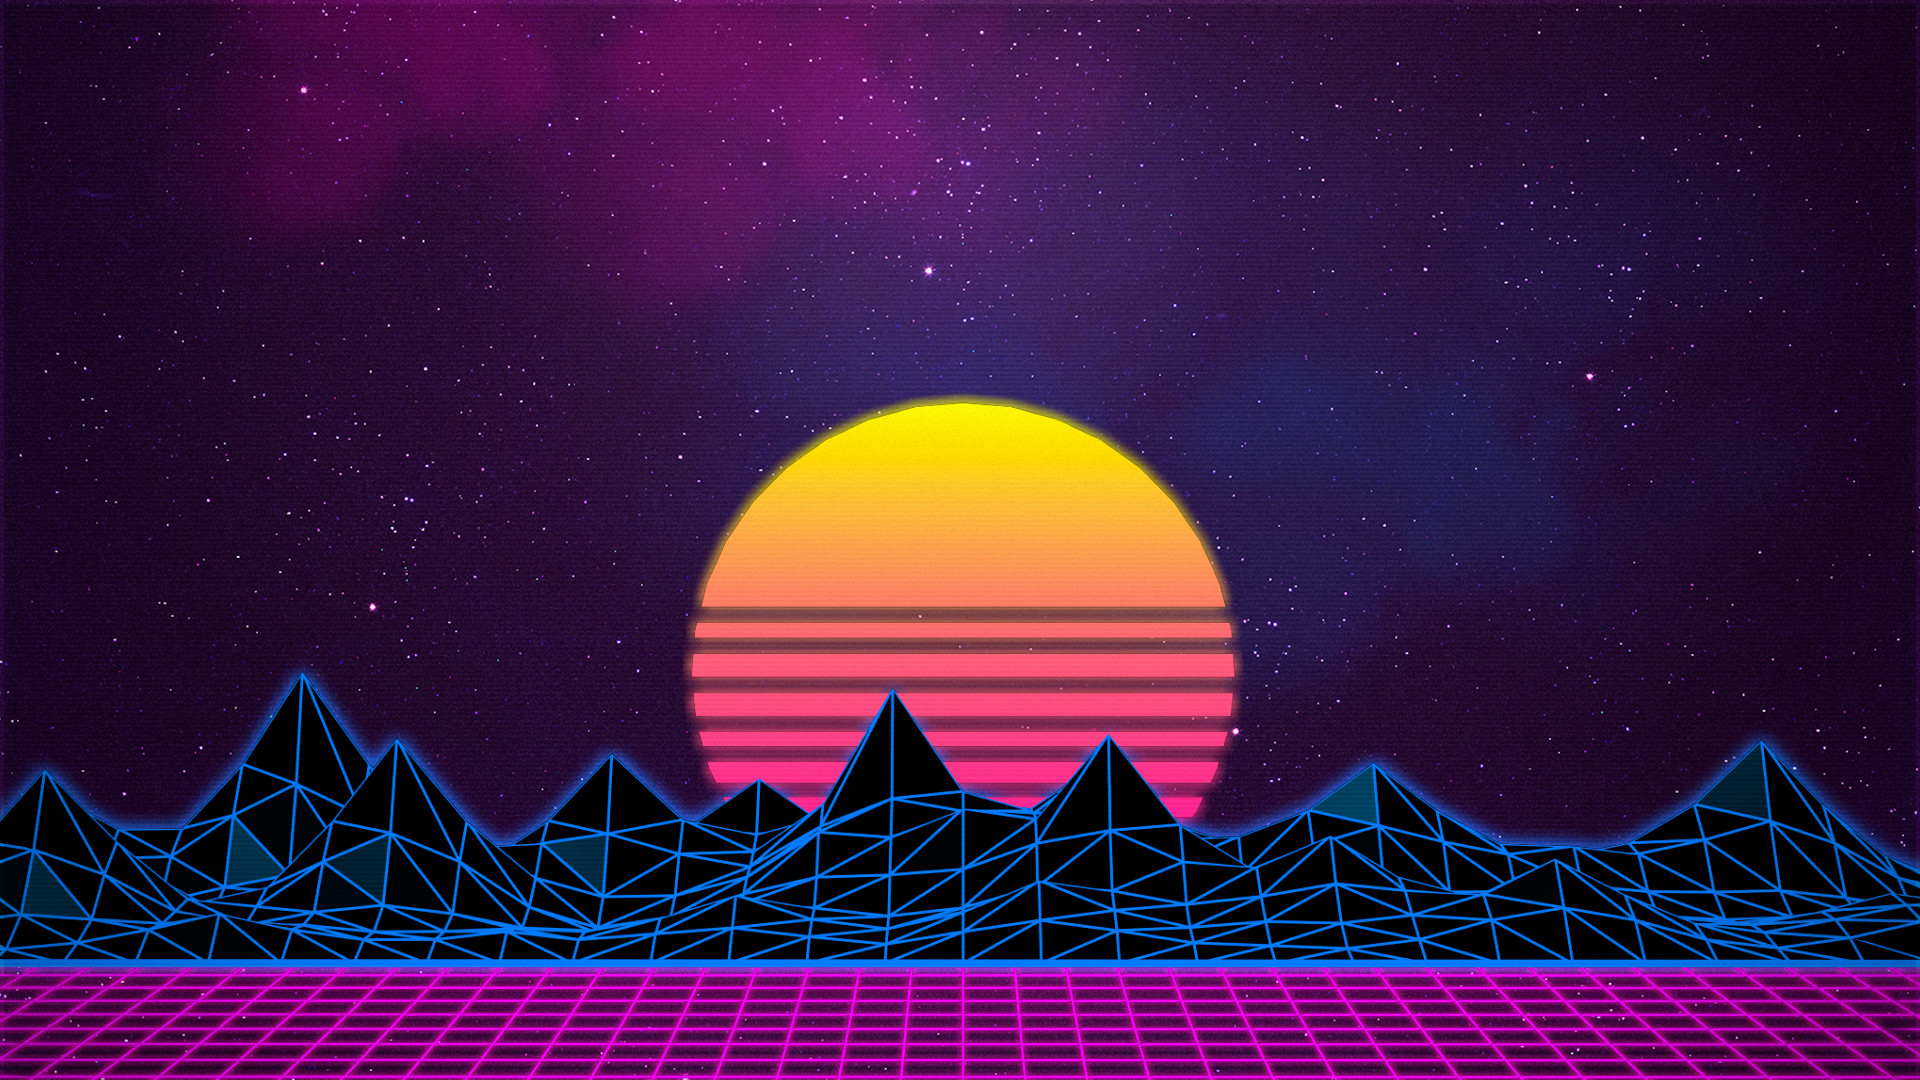 … new retro wave neon synthwave wallpaper no 383903 …